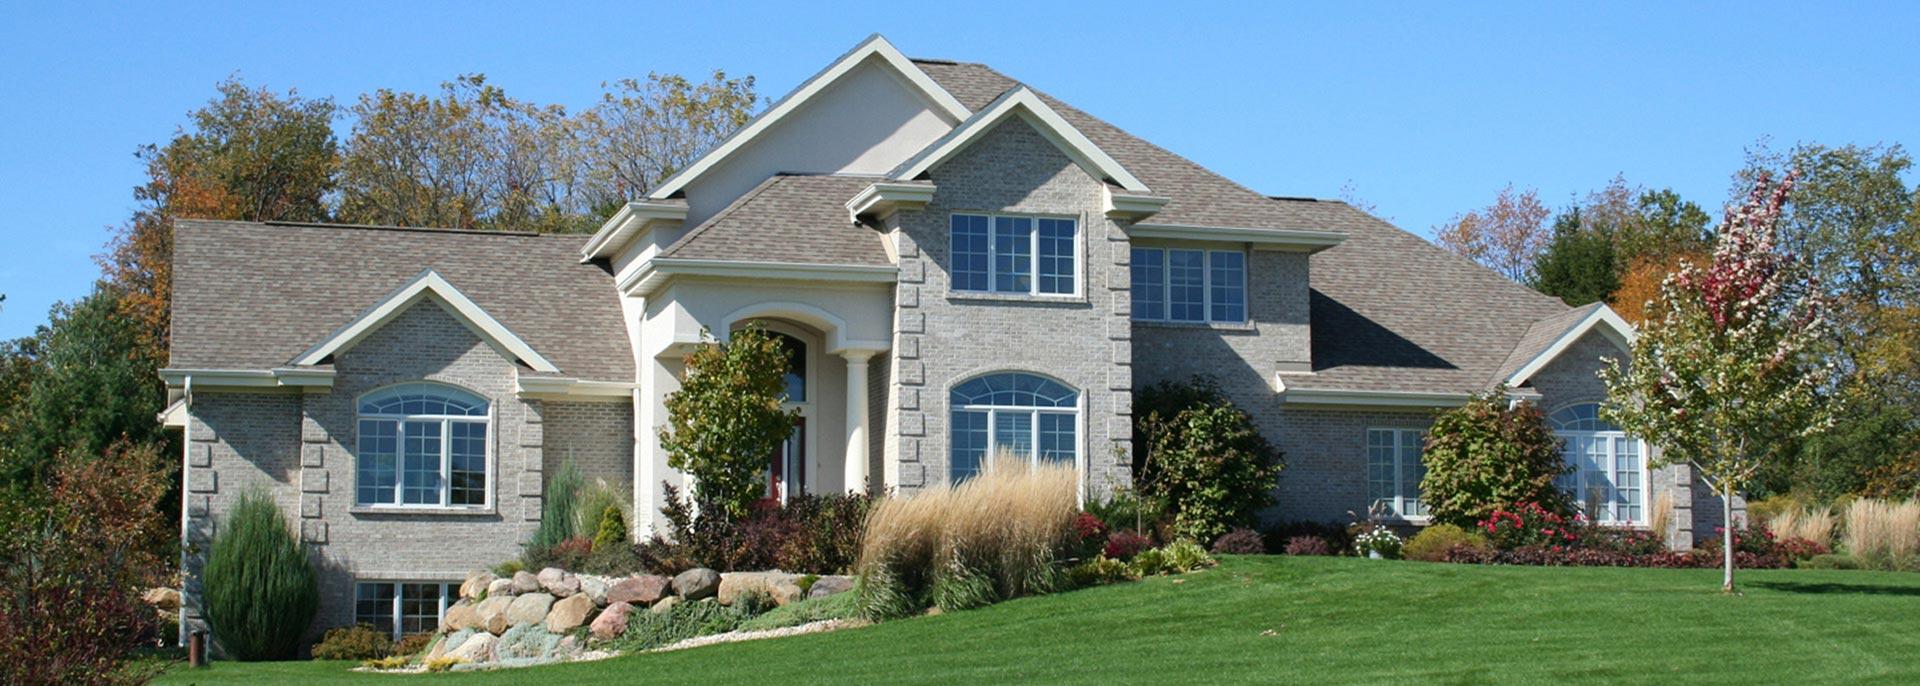 home renovation general contractor